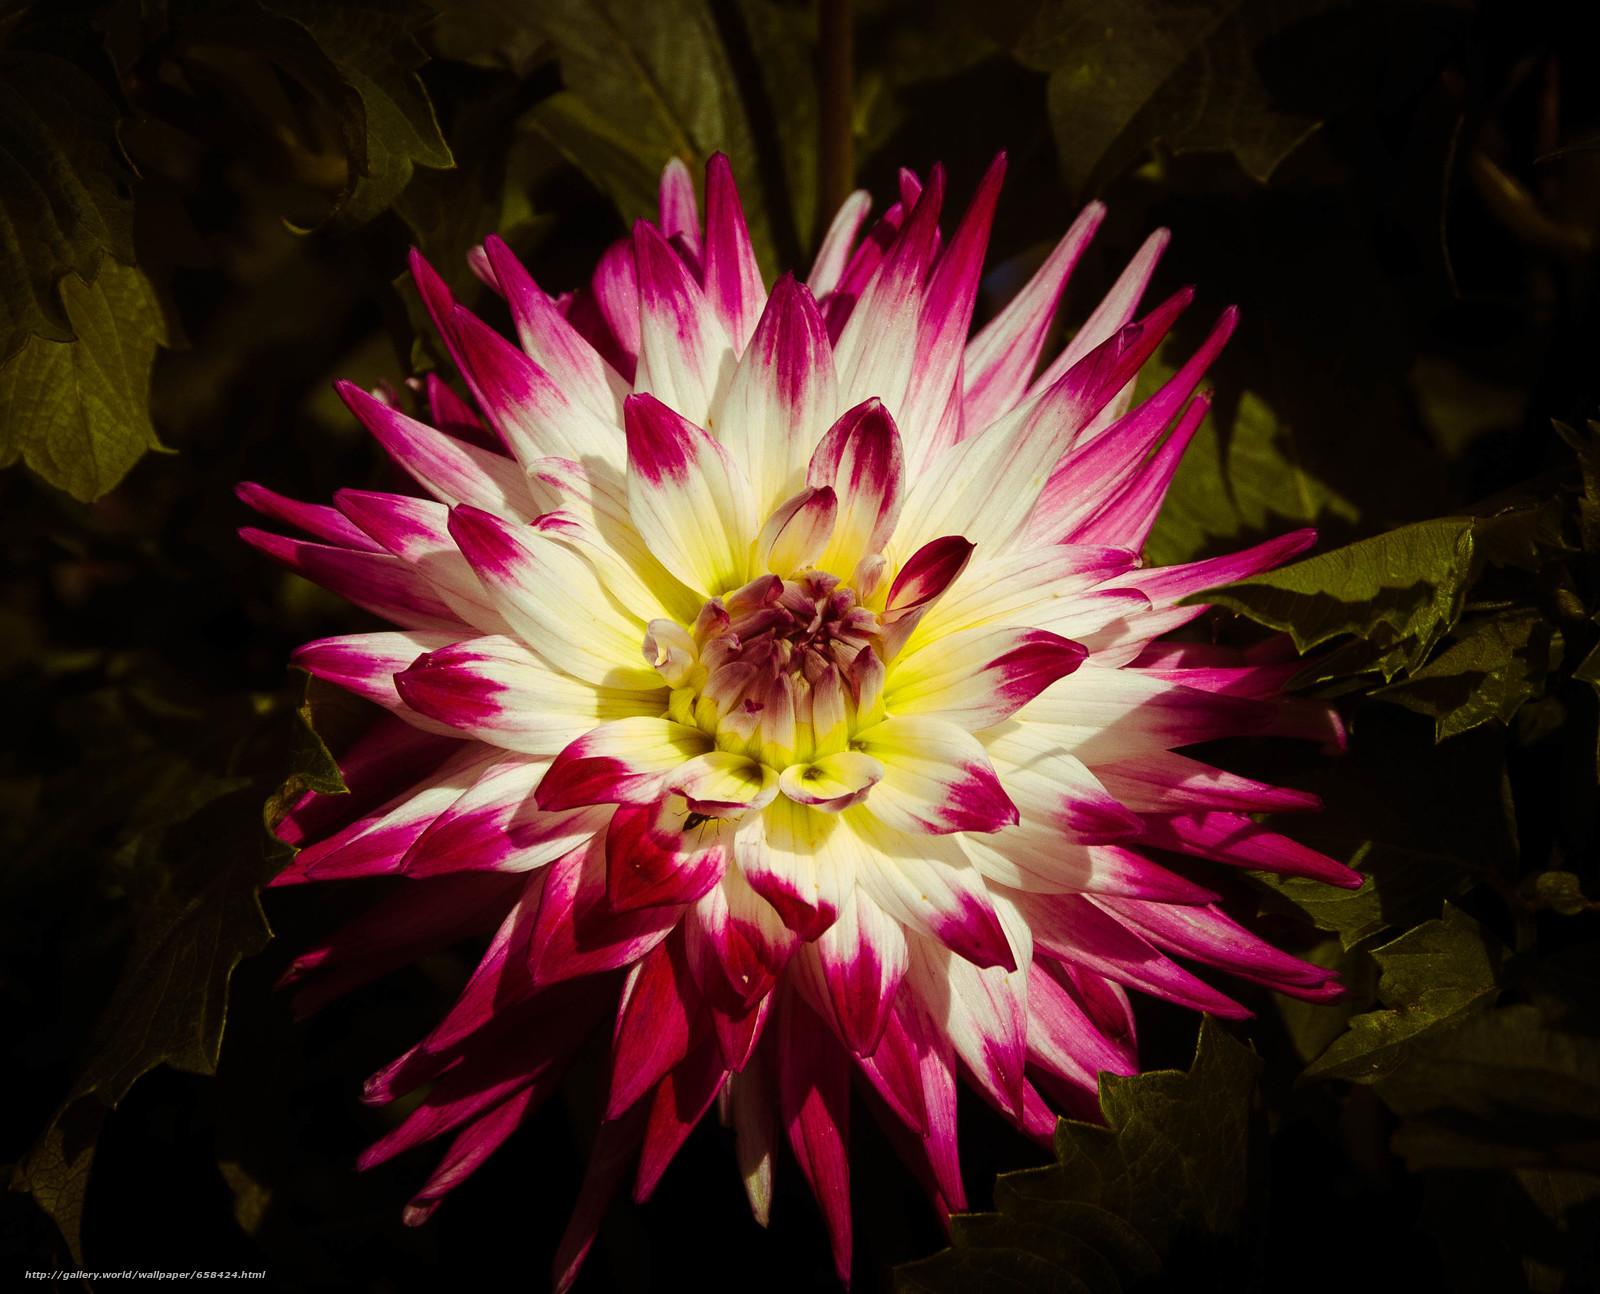 Download wallpaper flower,  Flowers,  flora,  dahlia free desktop wallpaper in the resolution 3301x2670 — picture №658424